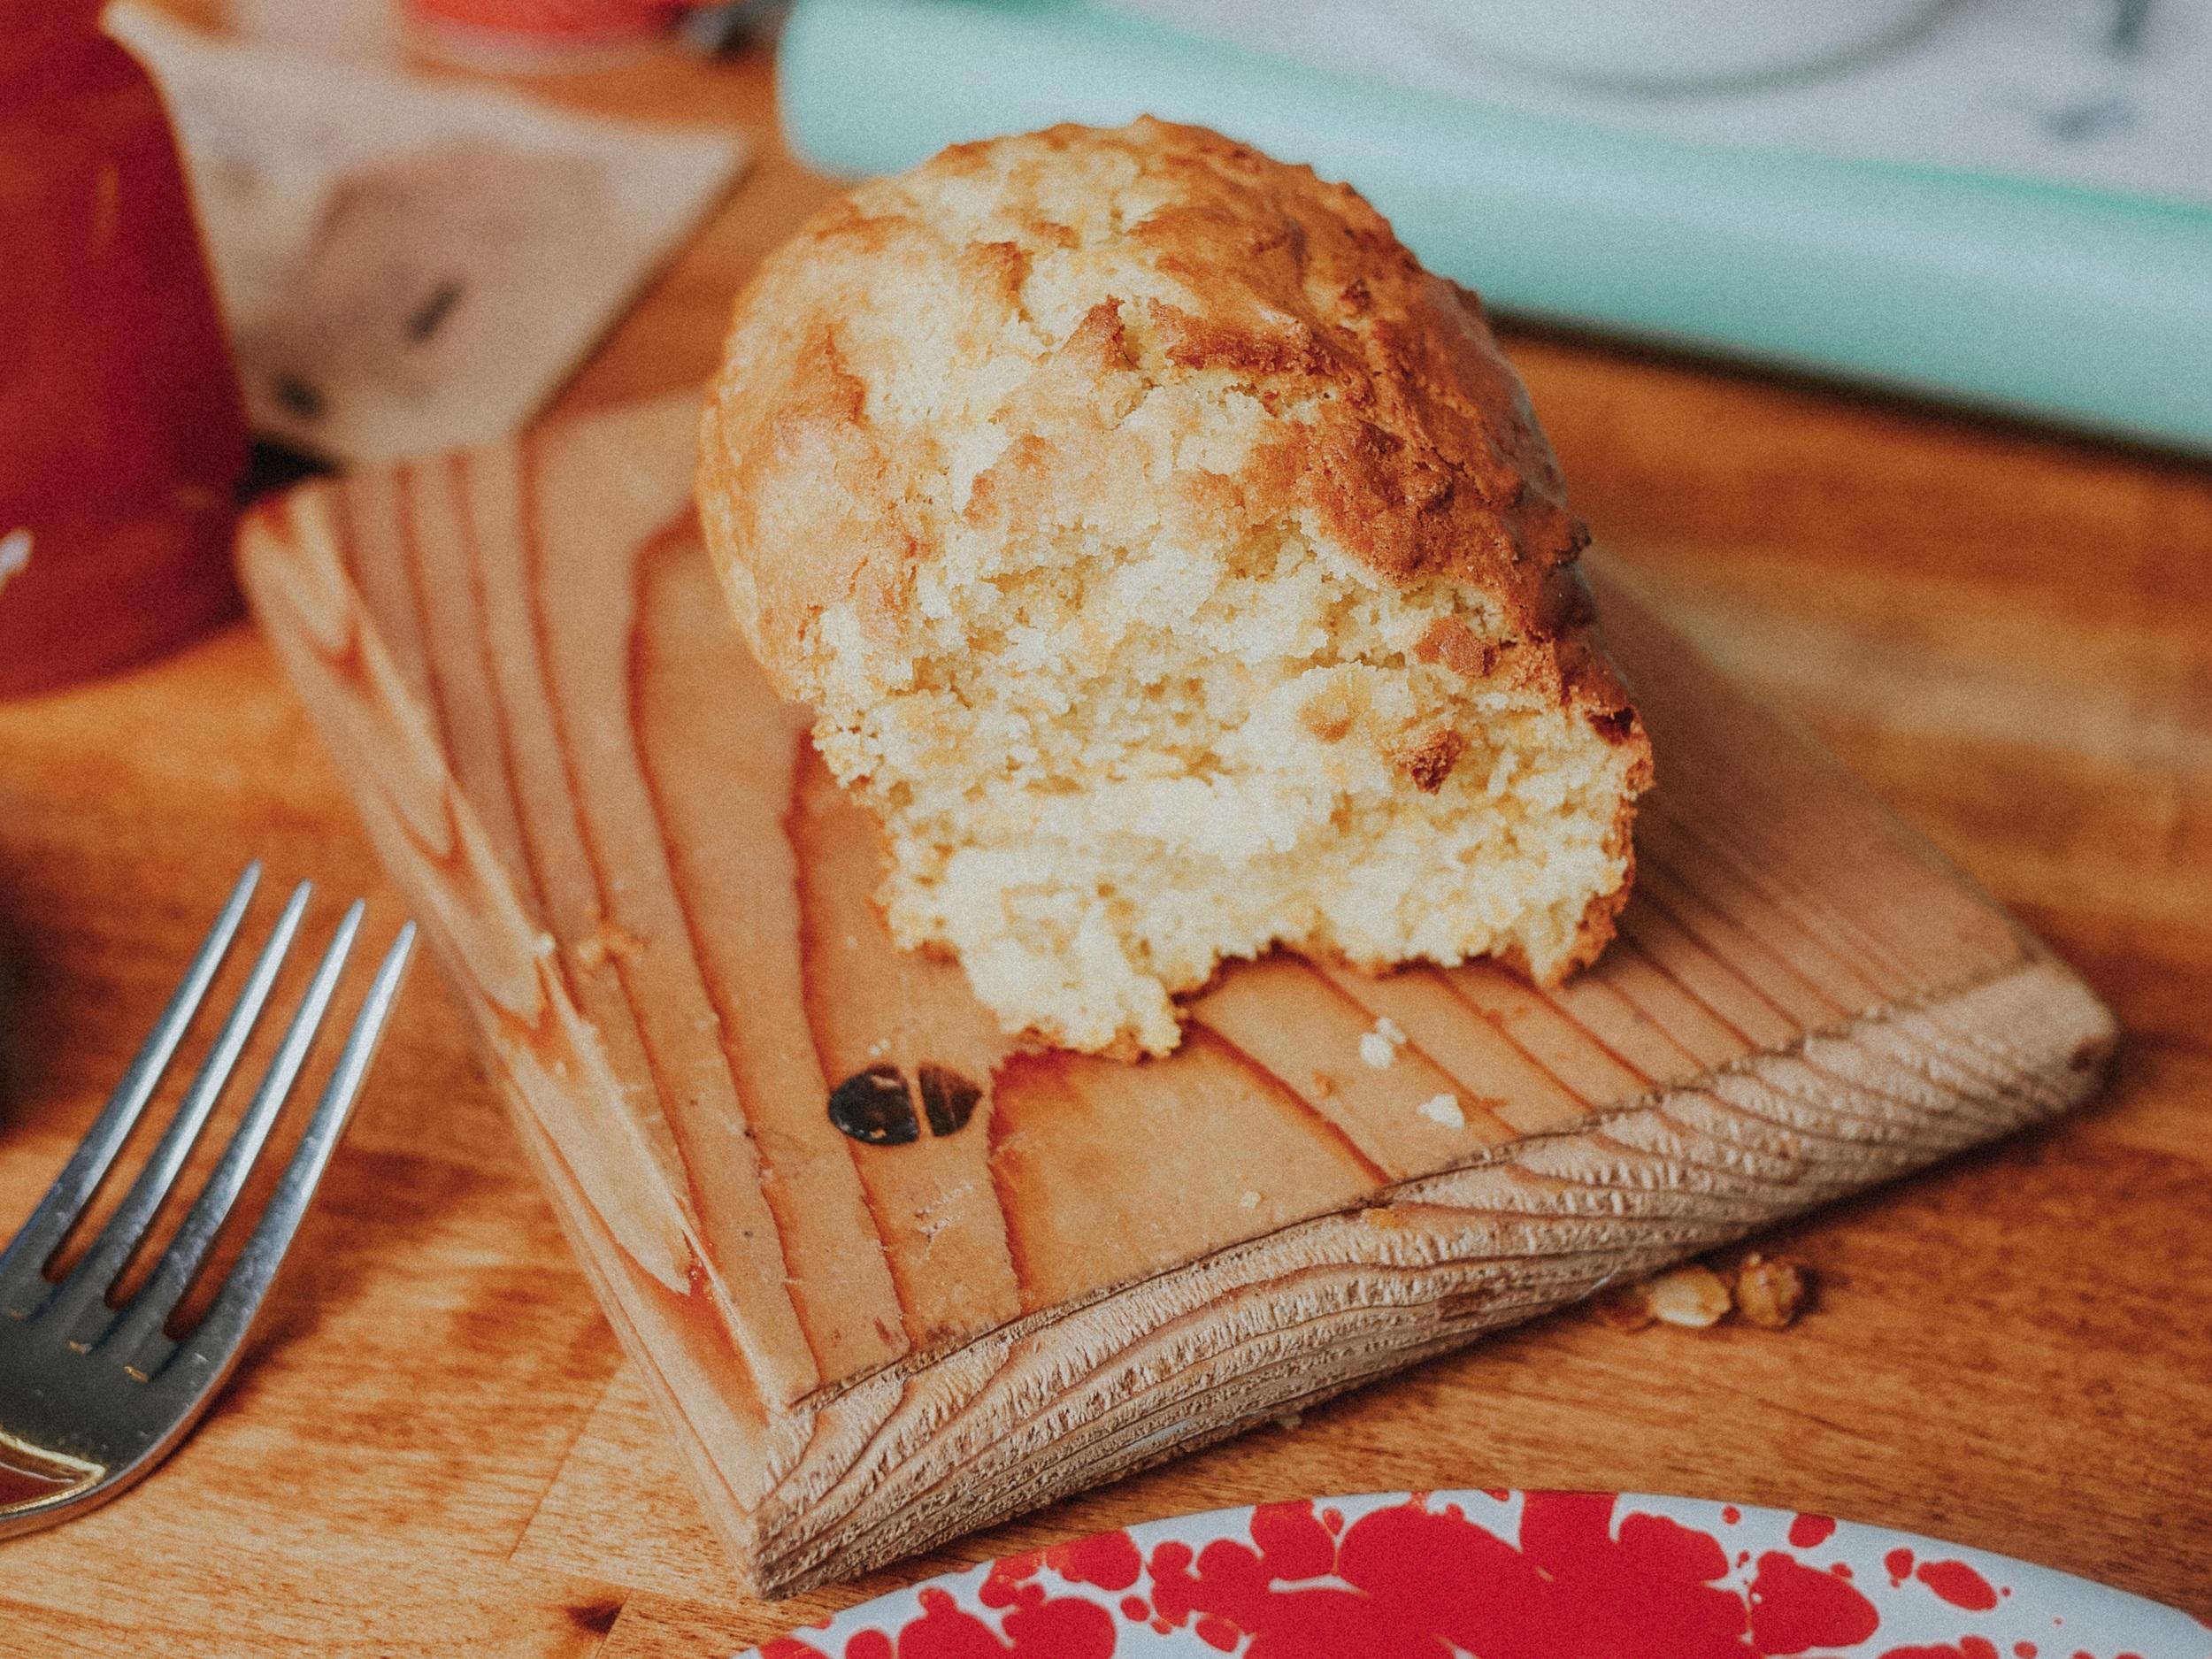 Butternut squash bread. Not pictured: Harbison clotted cream & jam